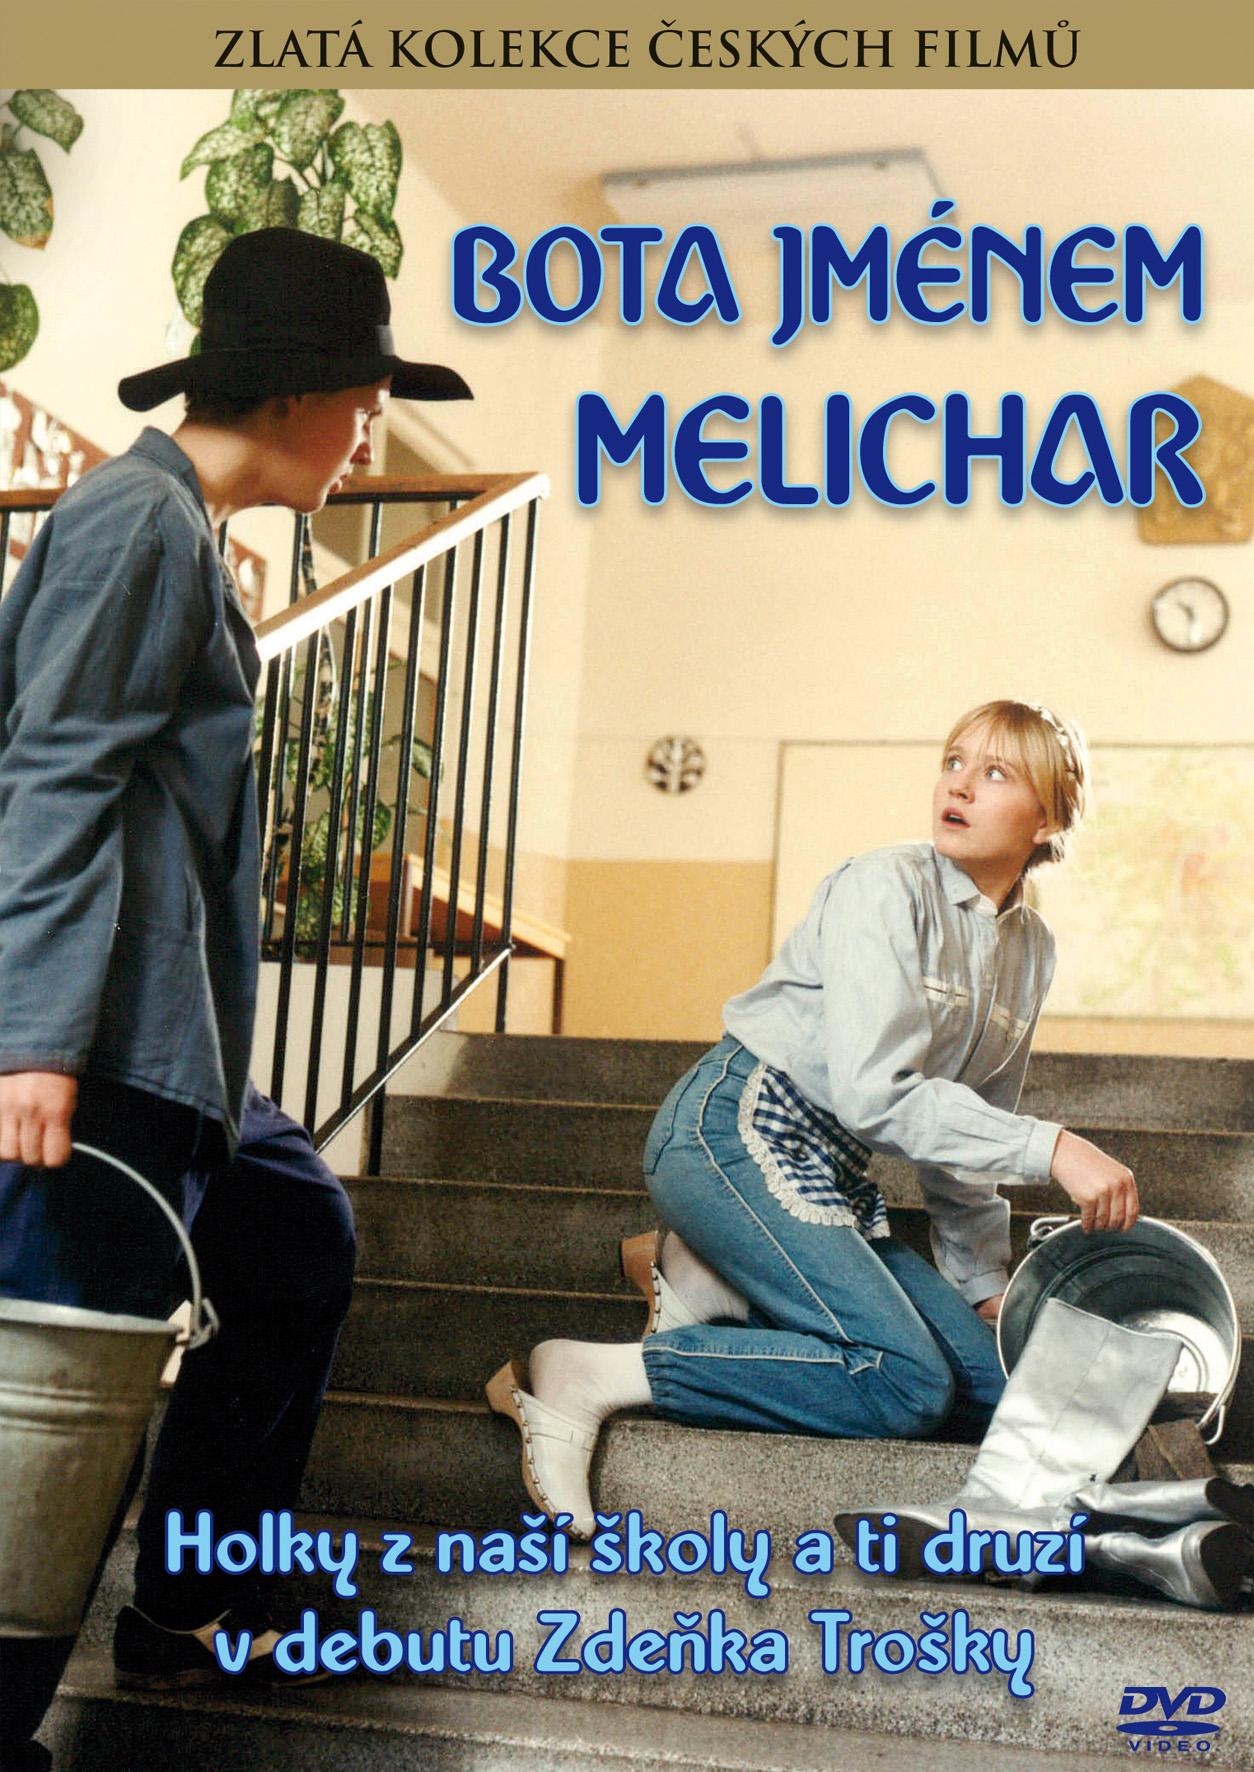 Film Bota jménem Melichar ke stažení - Film Bota jménem Melichar download